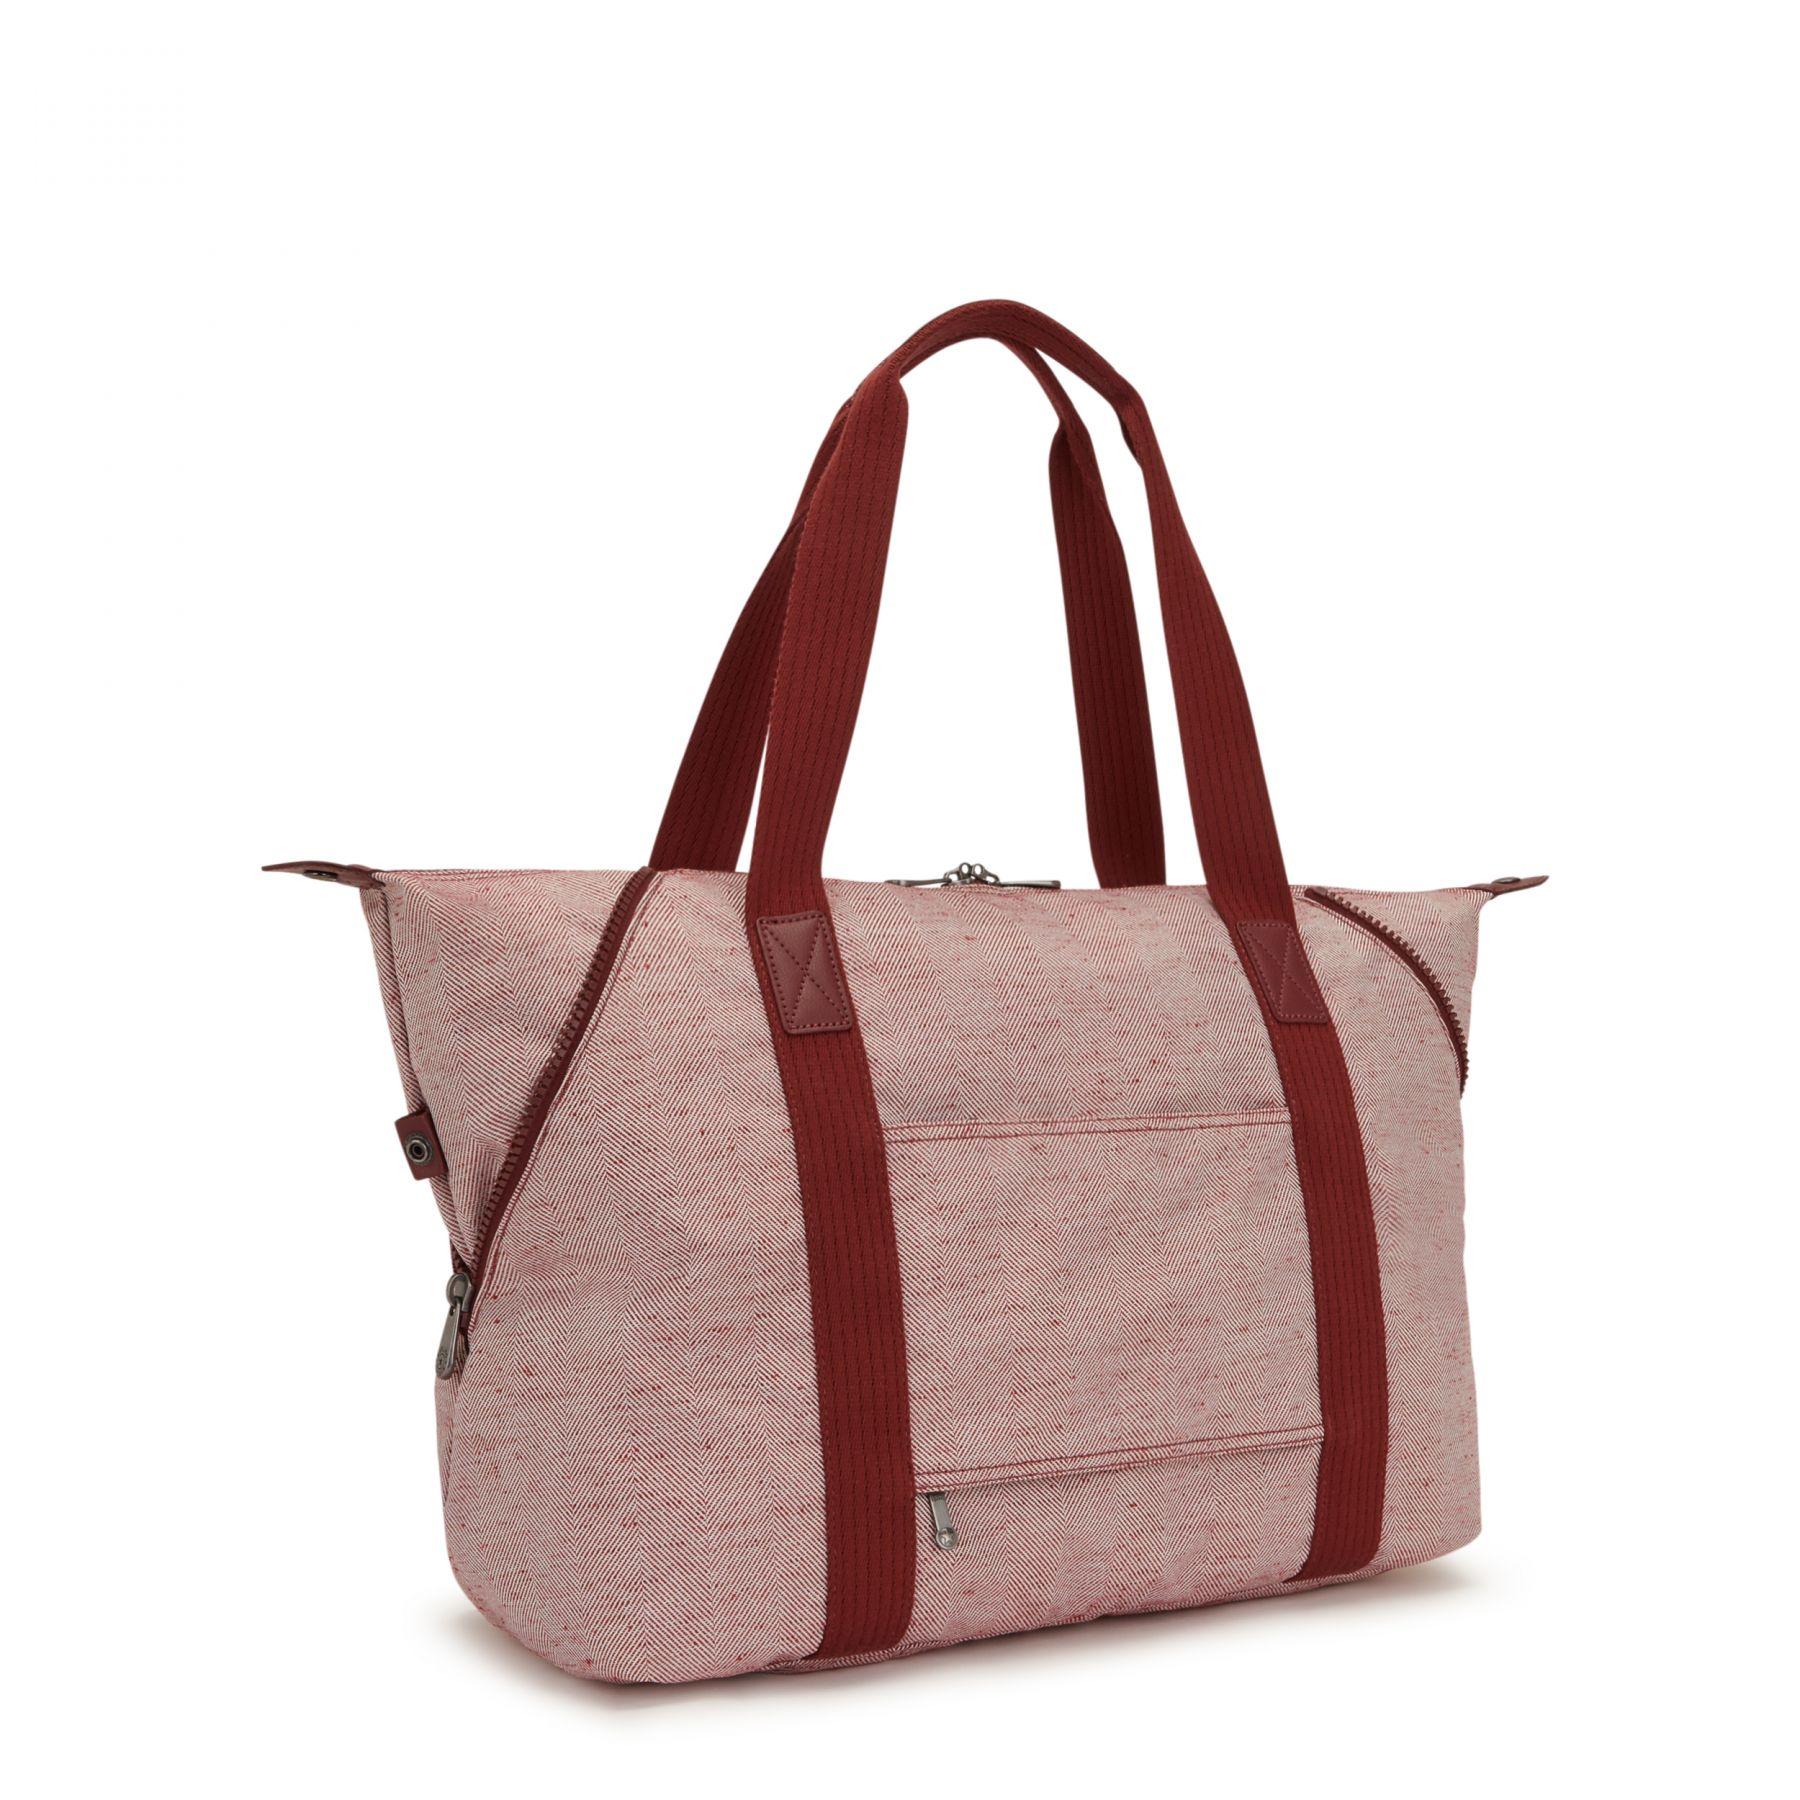 ART M BAGS by Kipling - Back view